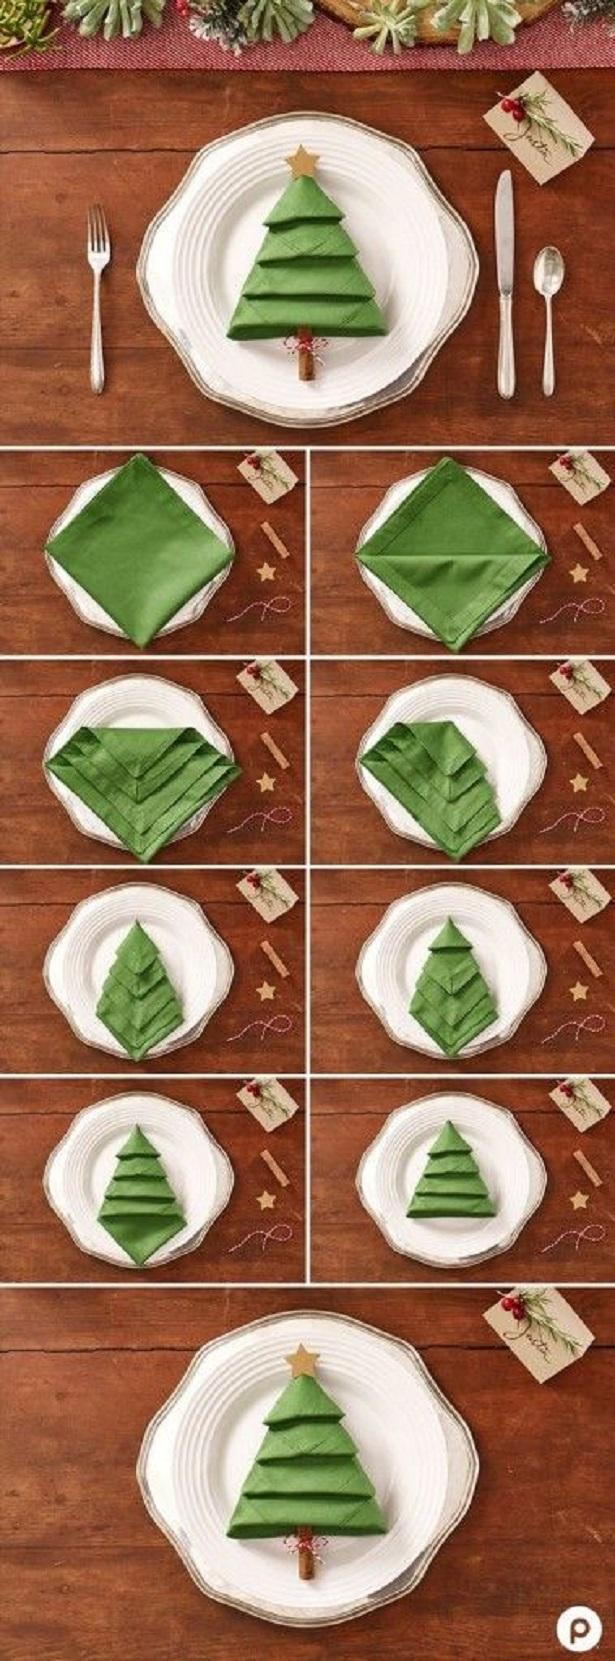 déco Noël rapide, DIY Noël Sapin Serviette en tissu